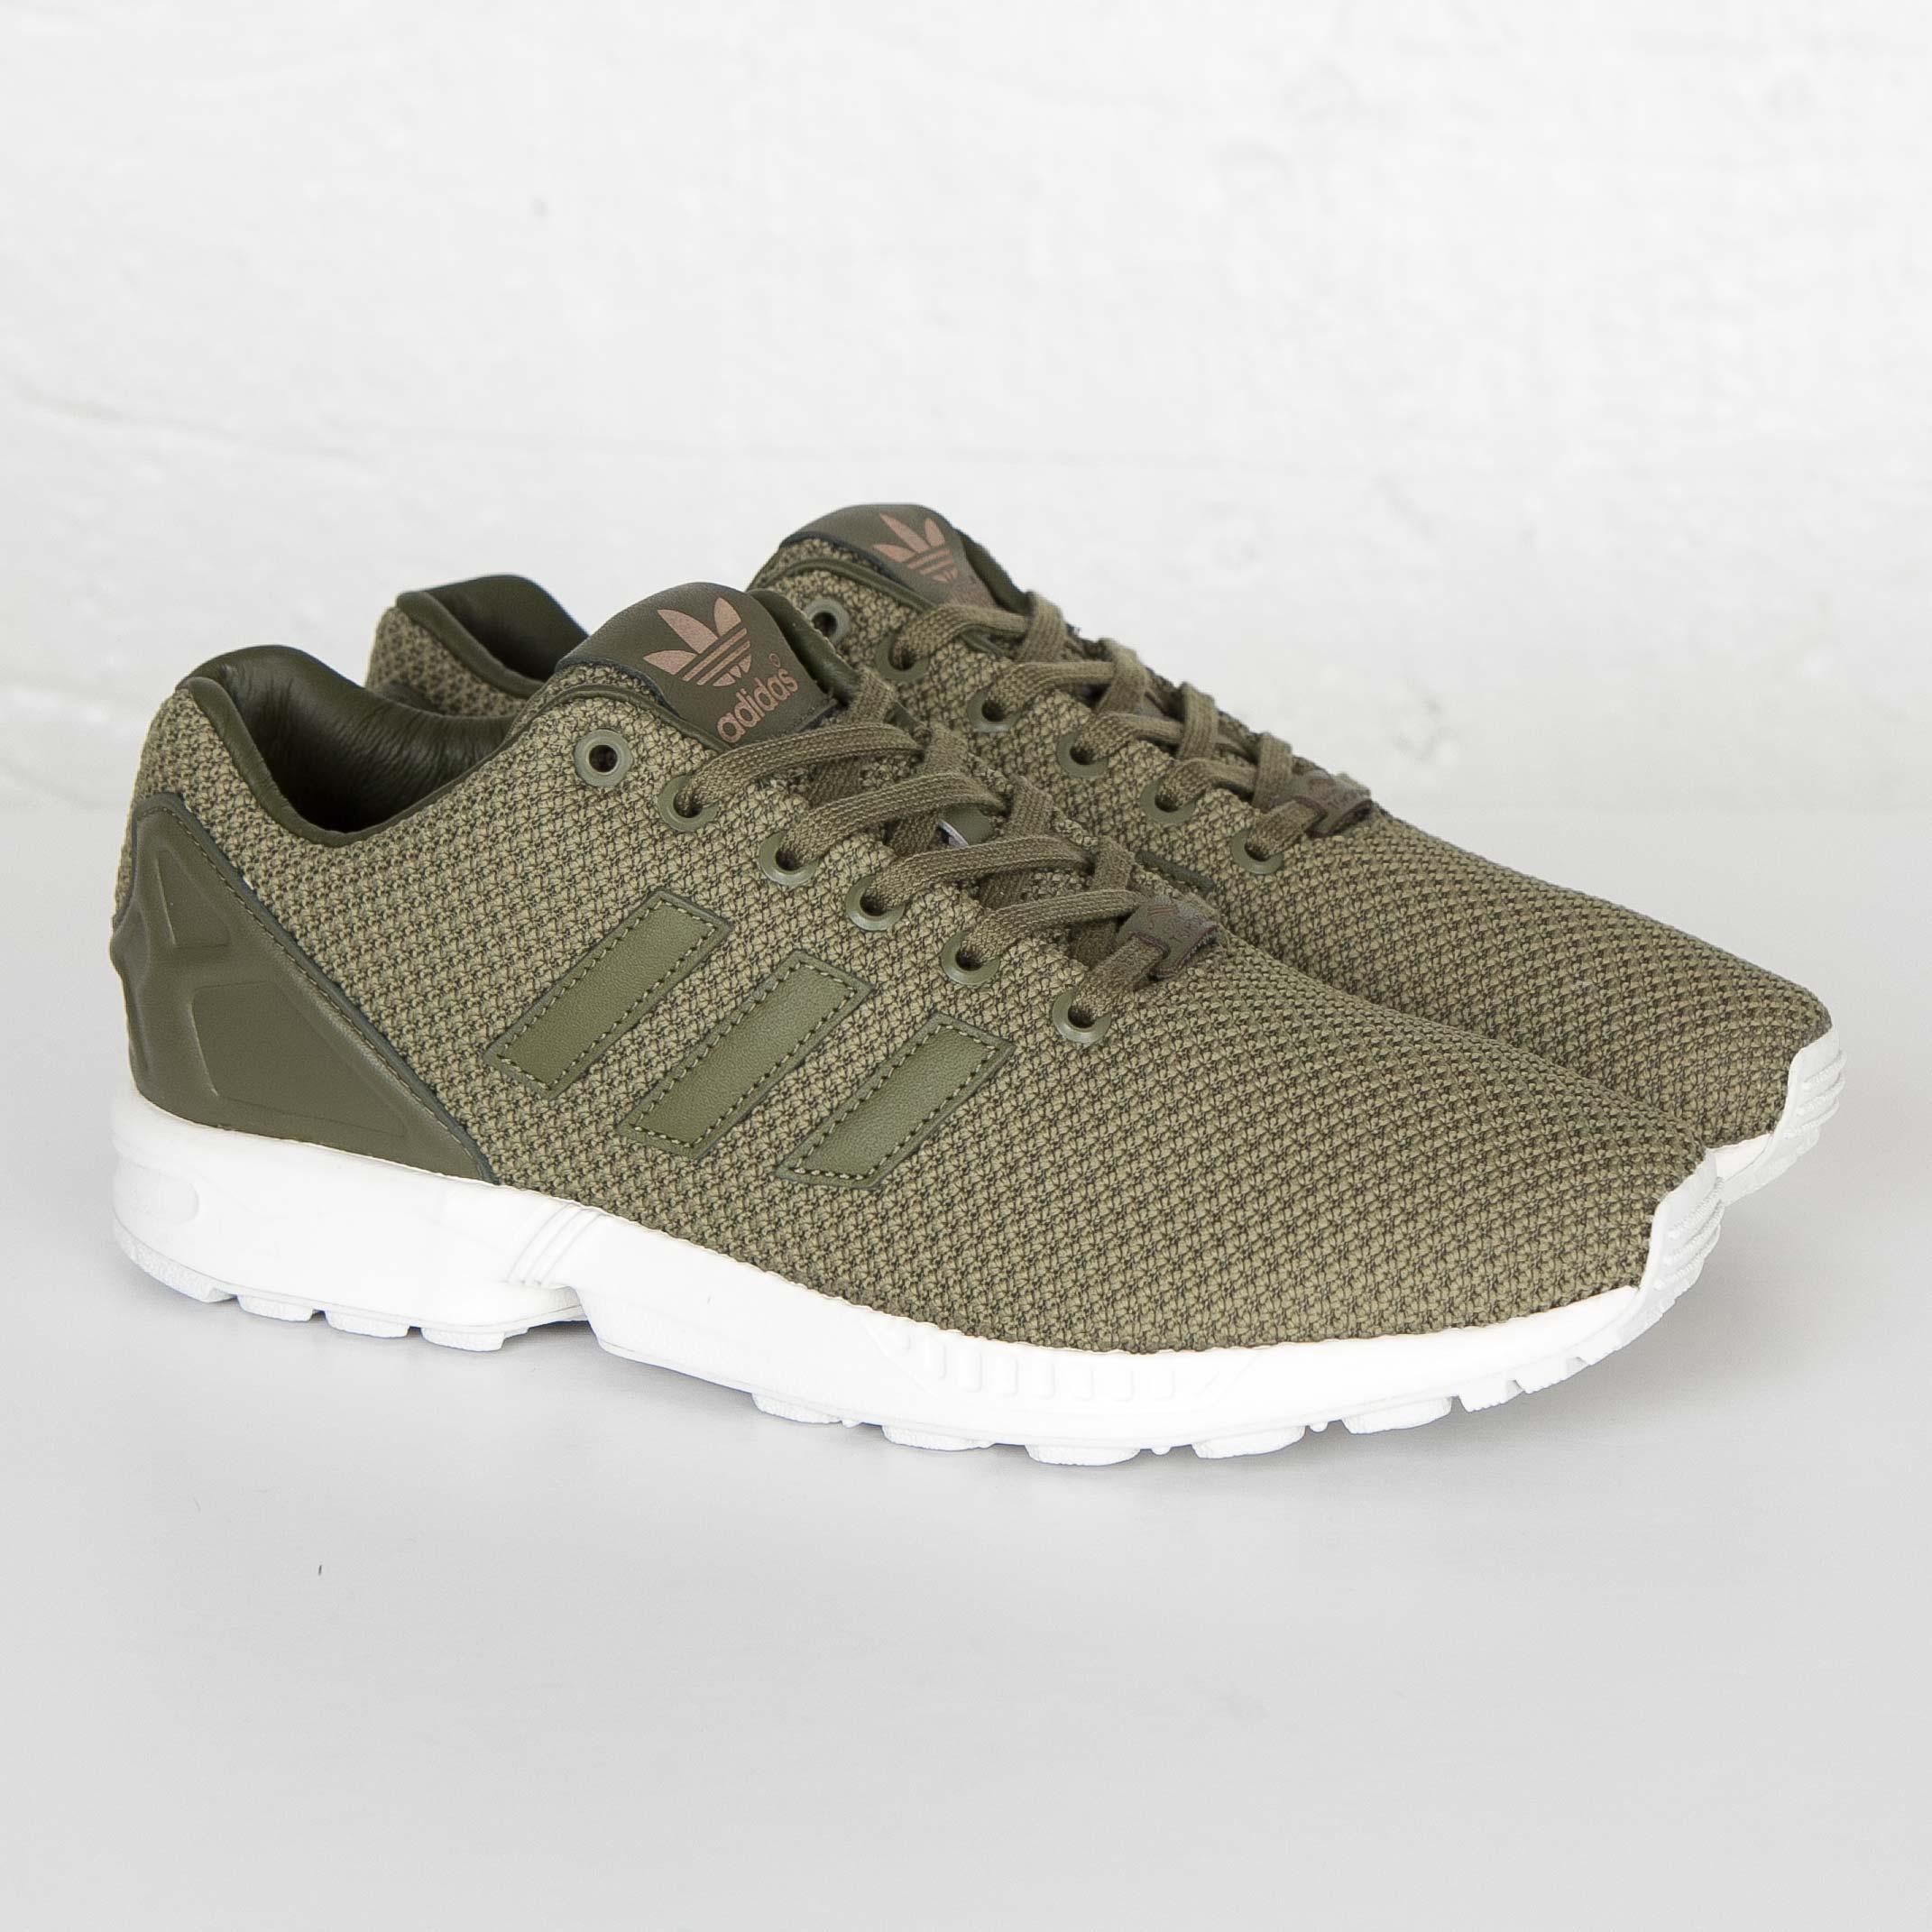 new arrival adb28 1b83d adidas ZX Flux - S79087 - Sneakersnstuff | sneakers ...